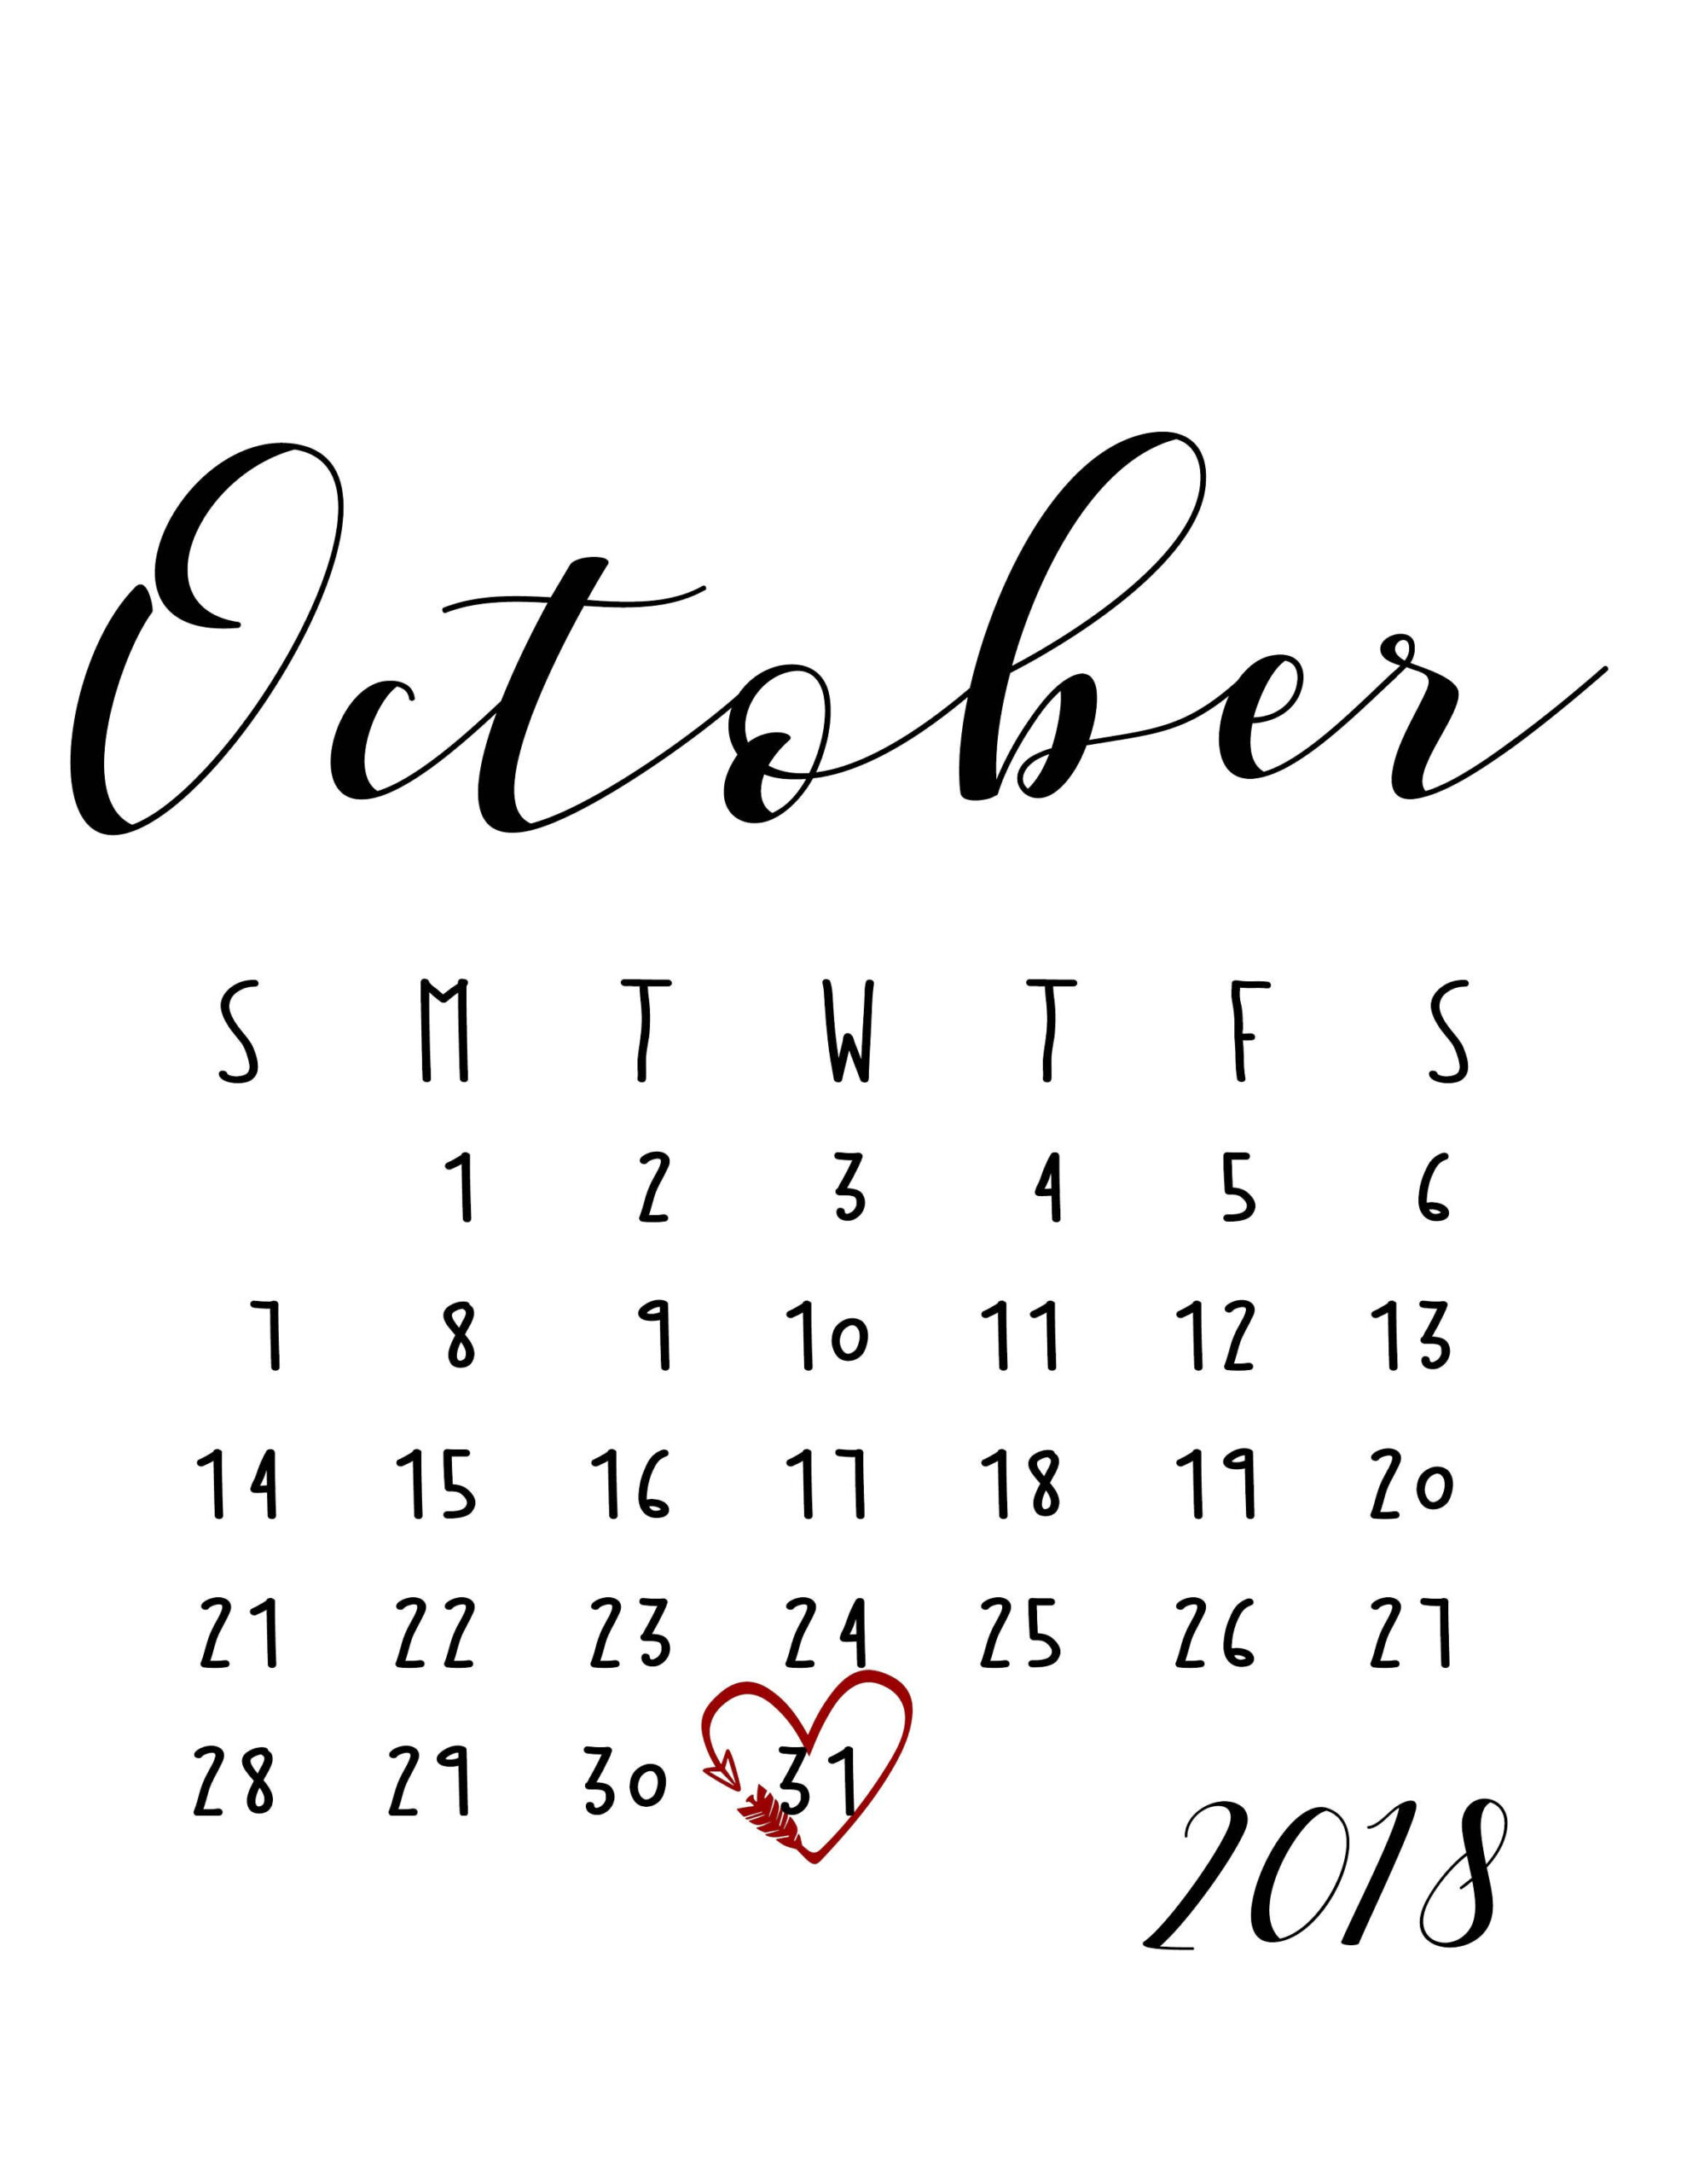 October 2018 Large Number Calendar | Baby Due Date Calendar in Large Number Calendar